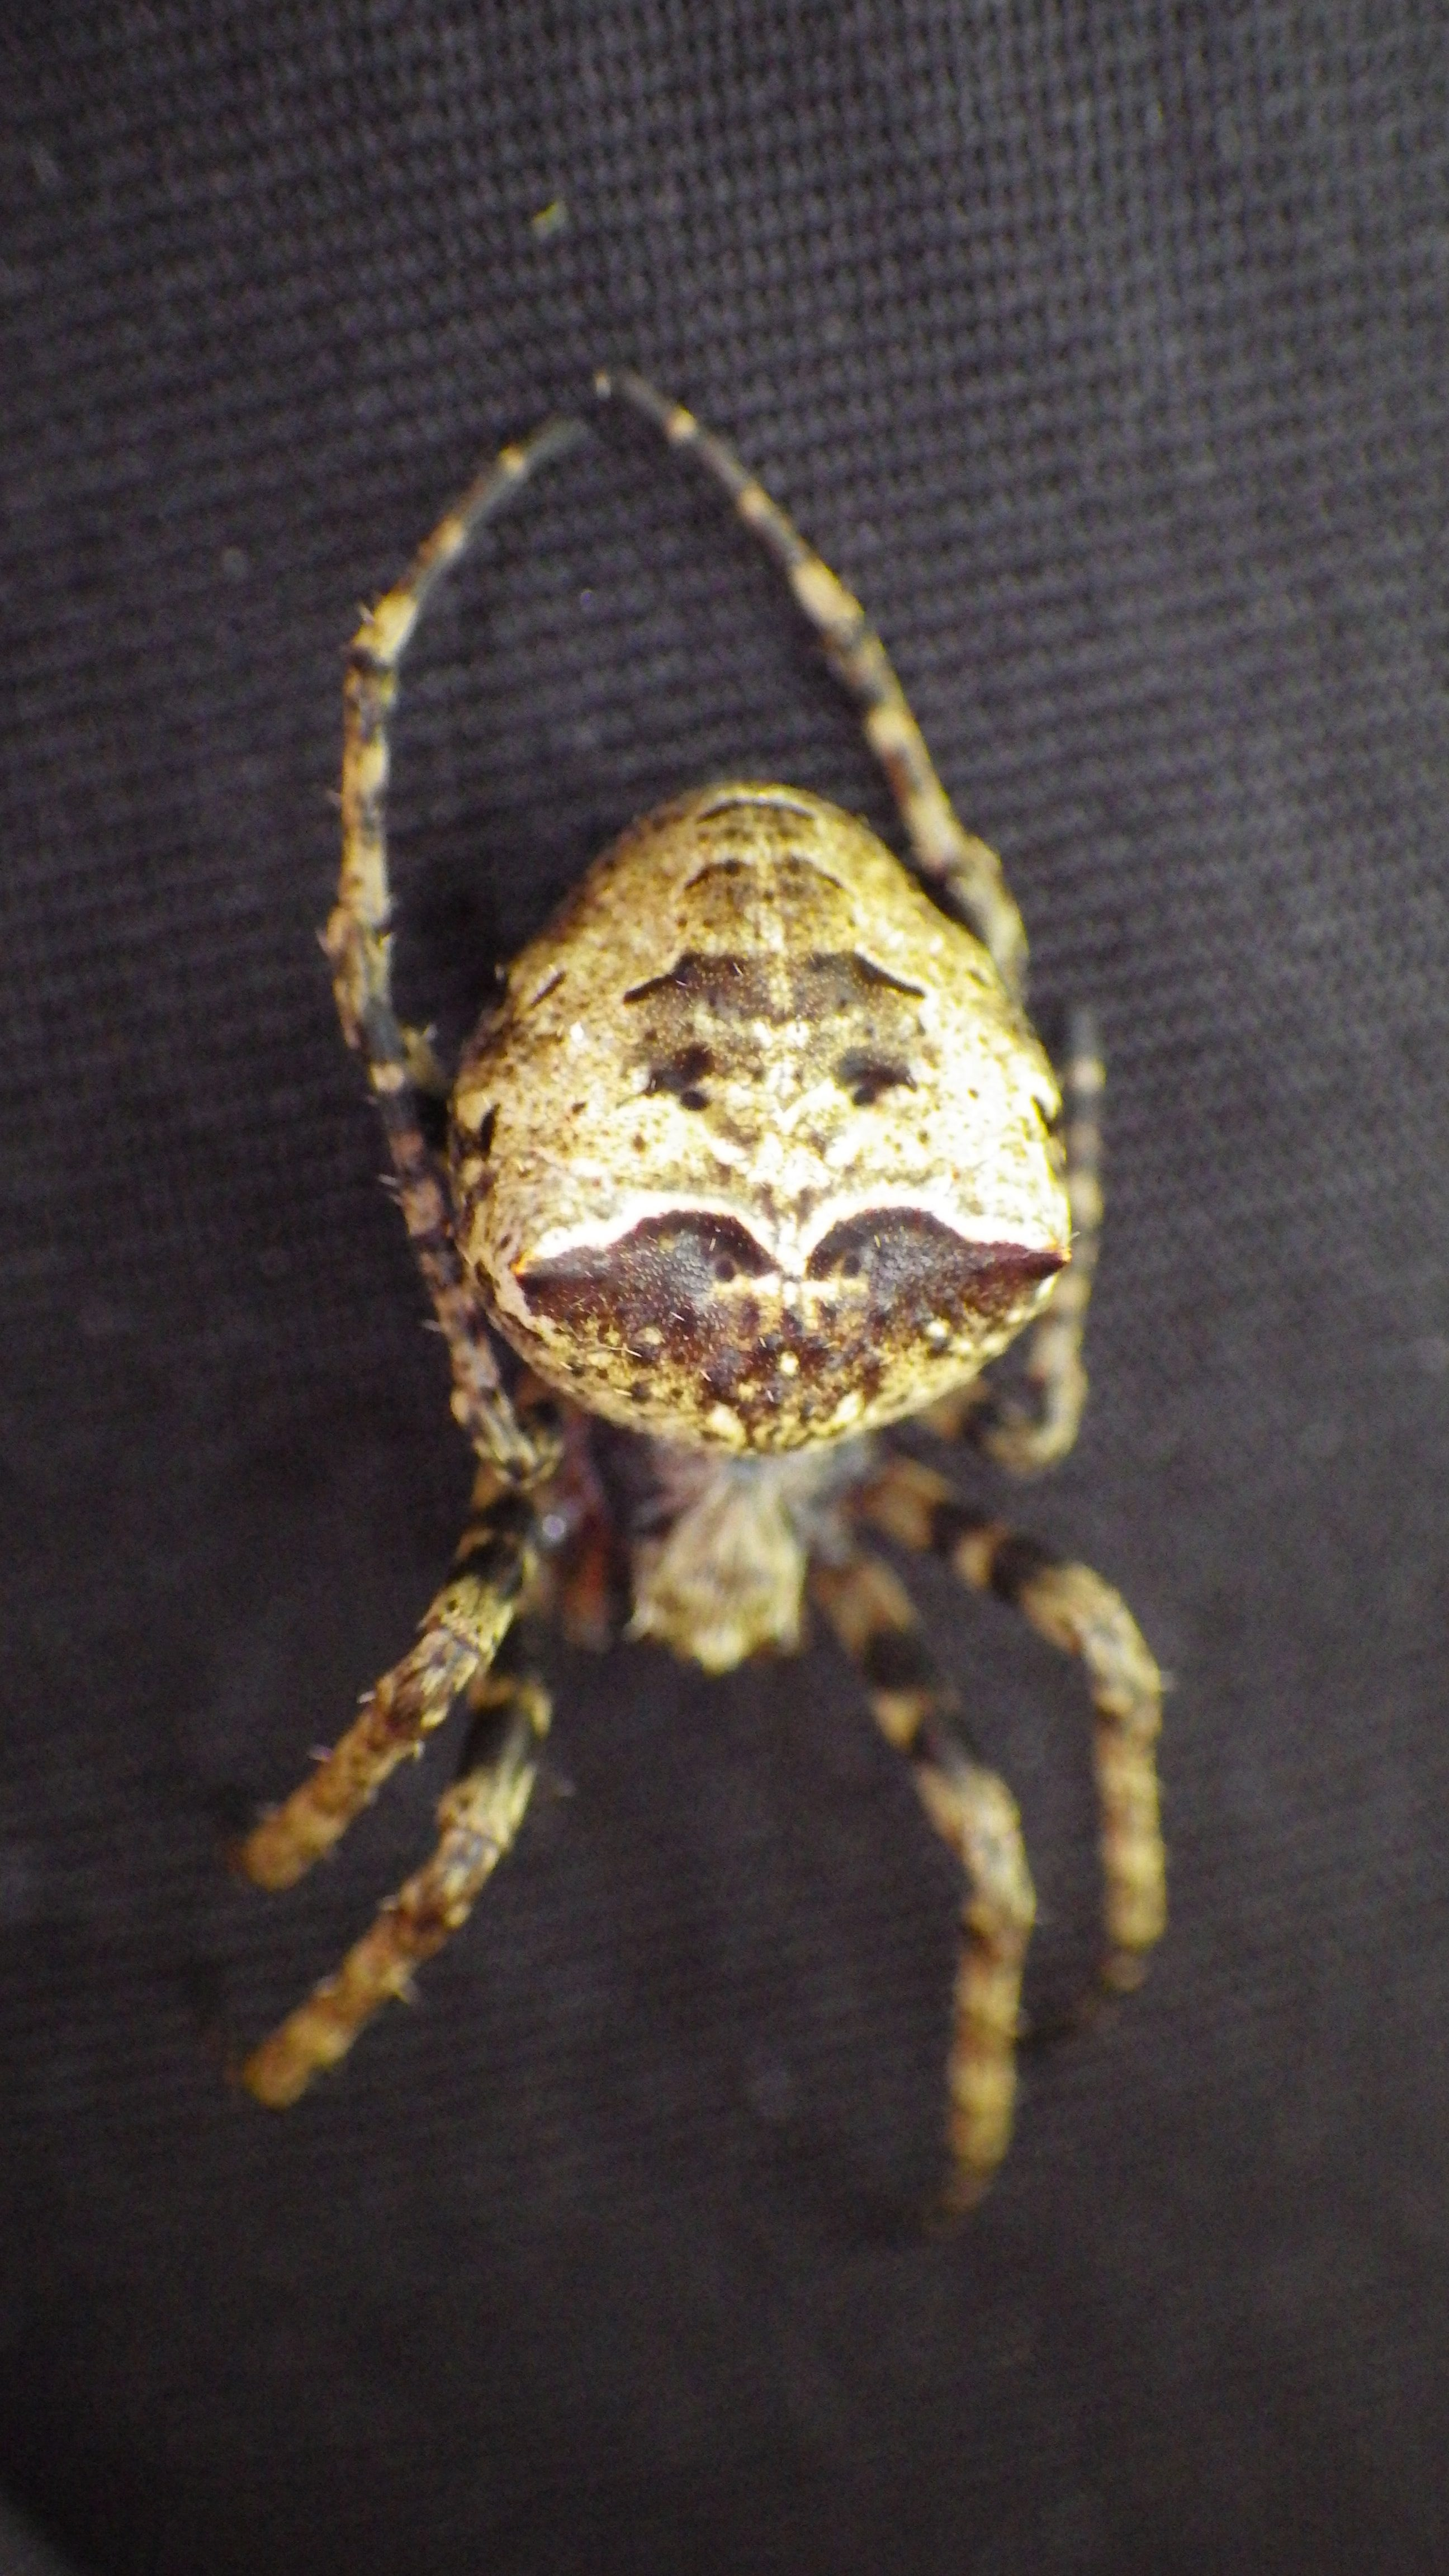 Picture of Gibbaranea - Dorsal